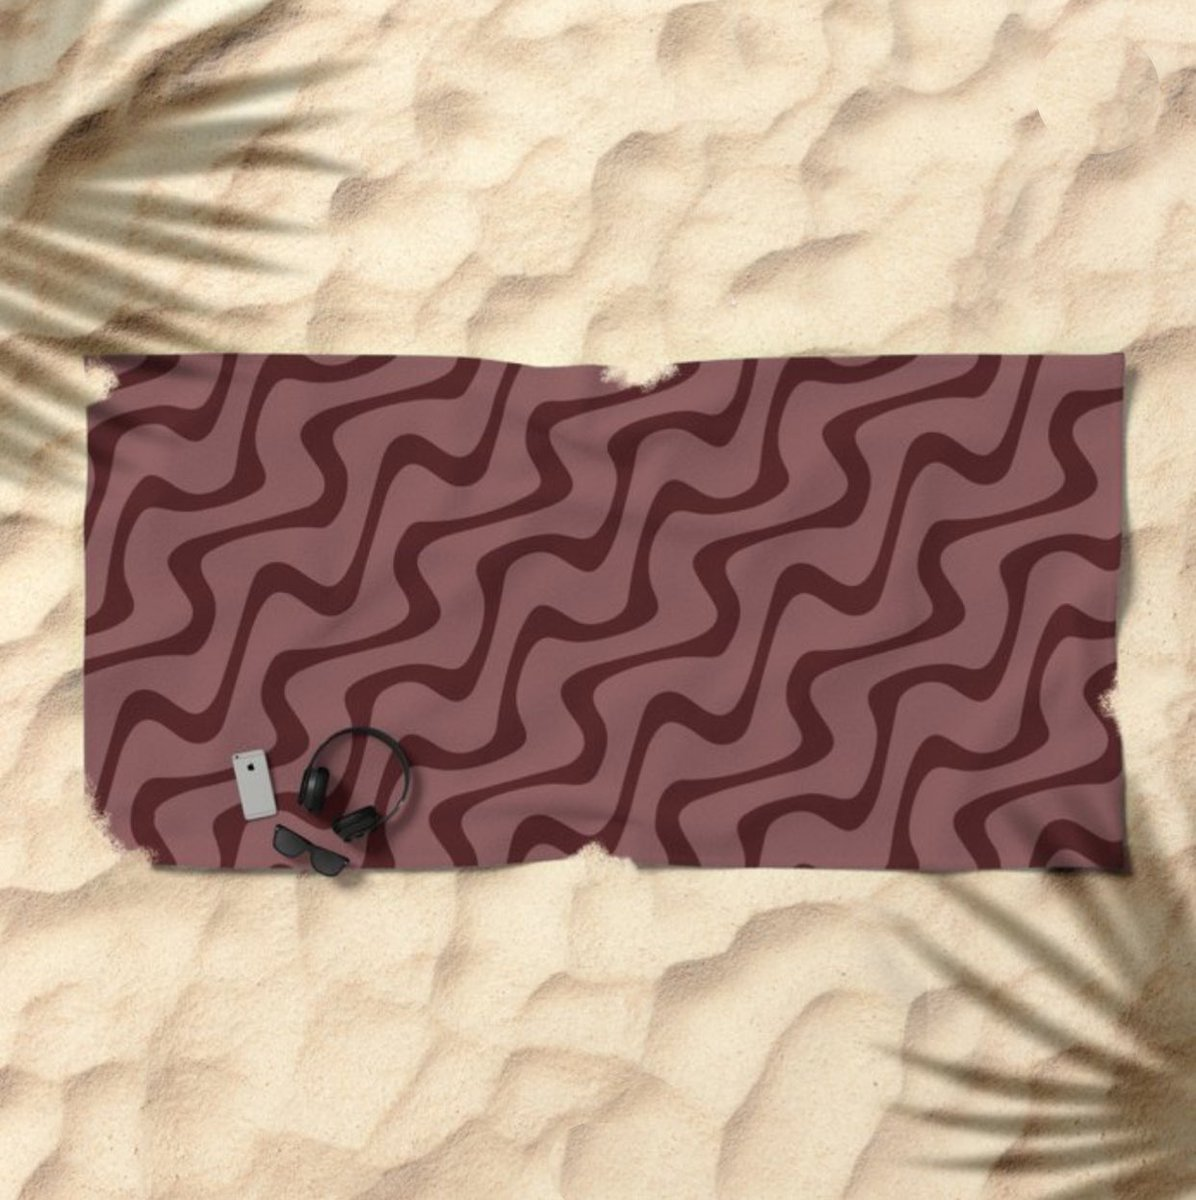 """Rosewood Zig Zag"" Beach Towel  #PulaskiShepherdCo #pscsco #RosewoodZigZag #BeachTowel #society6  https://society6.com/pscscopic.twitter.com/GBwrMbw9WF"